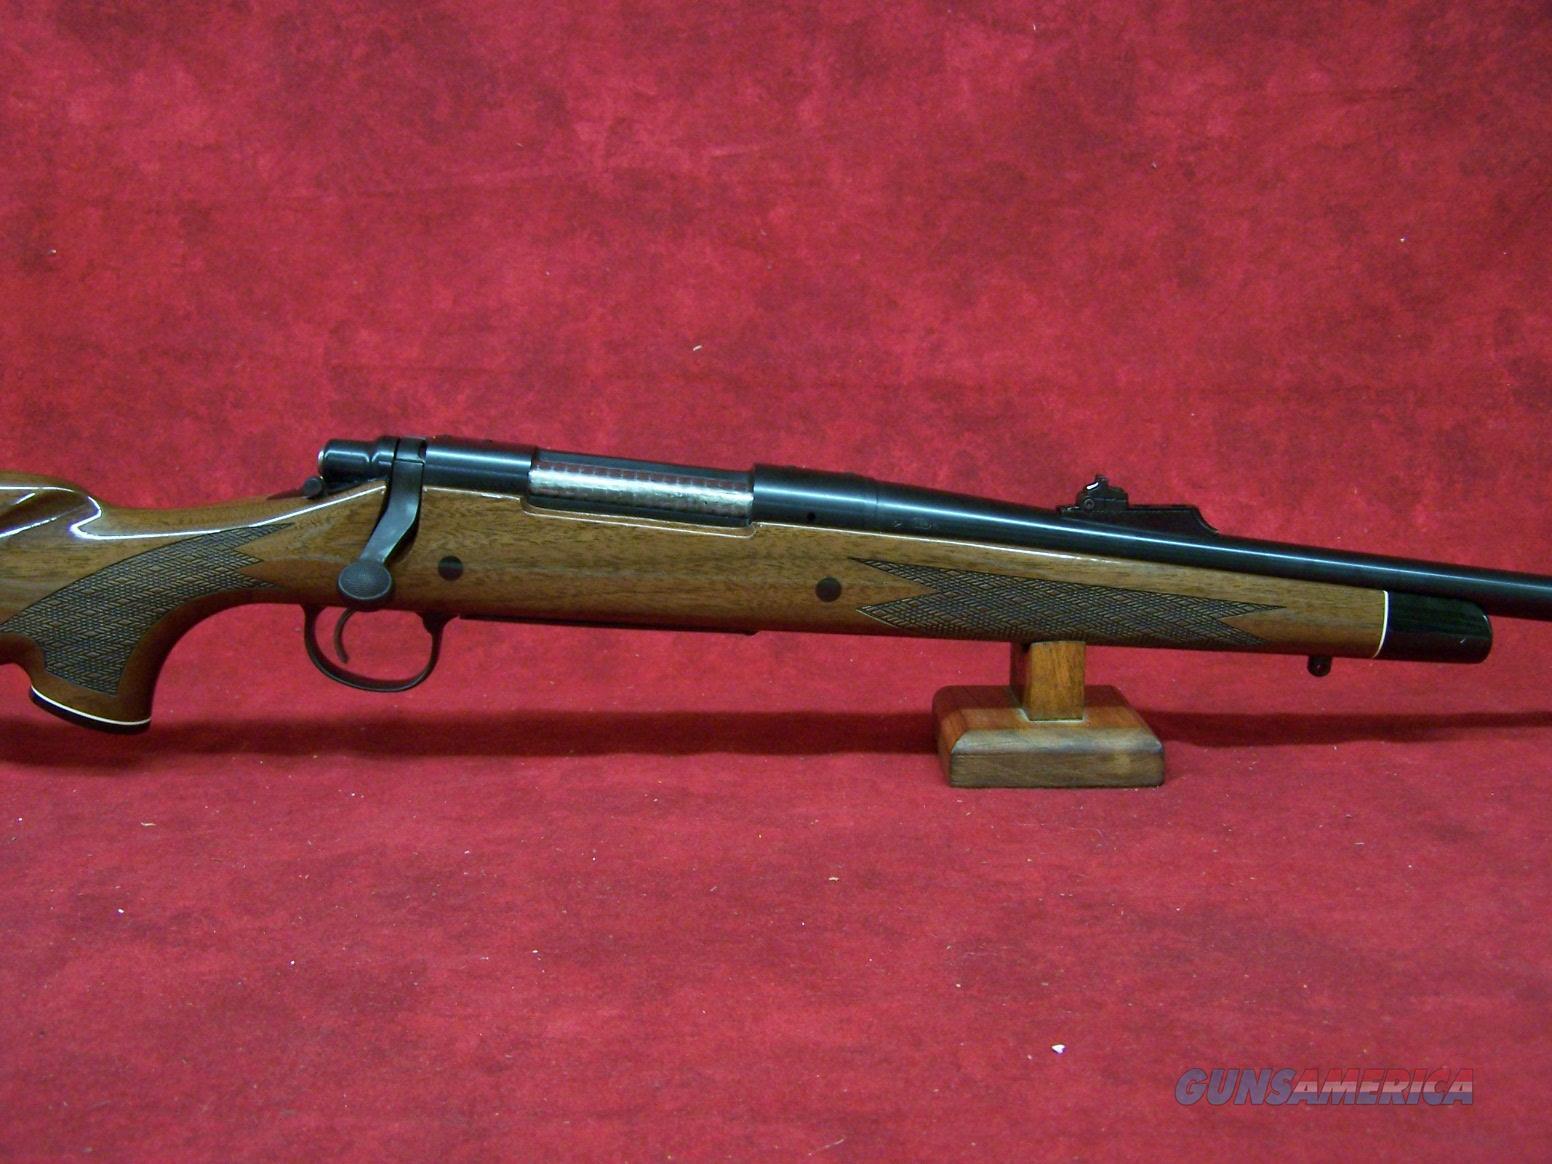 "Remington Model 700 BDL 7mm Mag 24"" Barrel X-Mark Pro Trigger Blue Finish Walnut Stock (25803)  Guns > Rifles > Remington Rifles - Modern > Model 700 > Sporting"